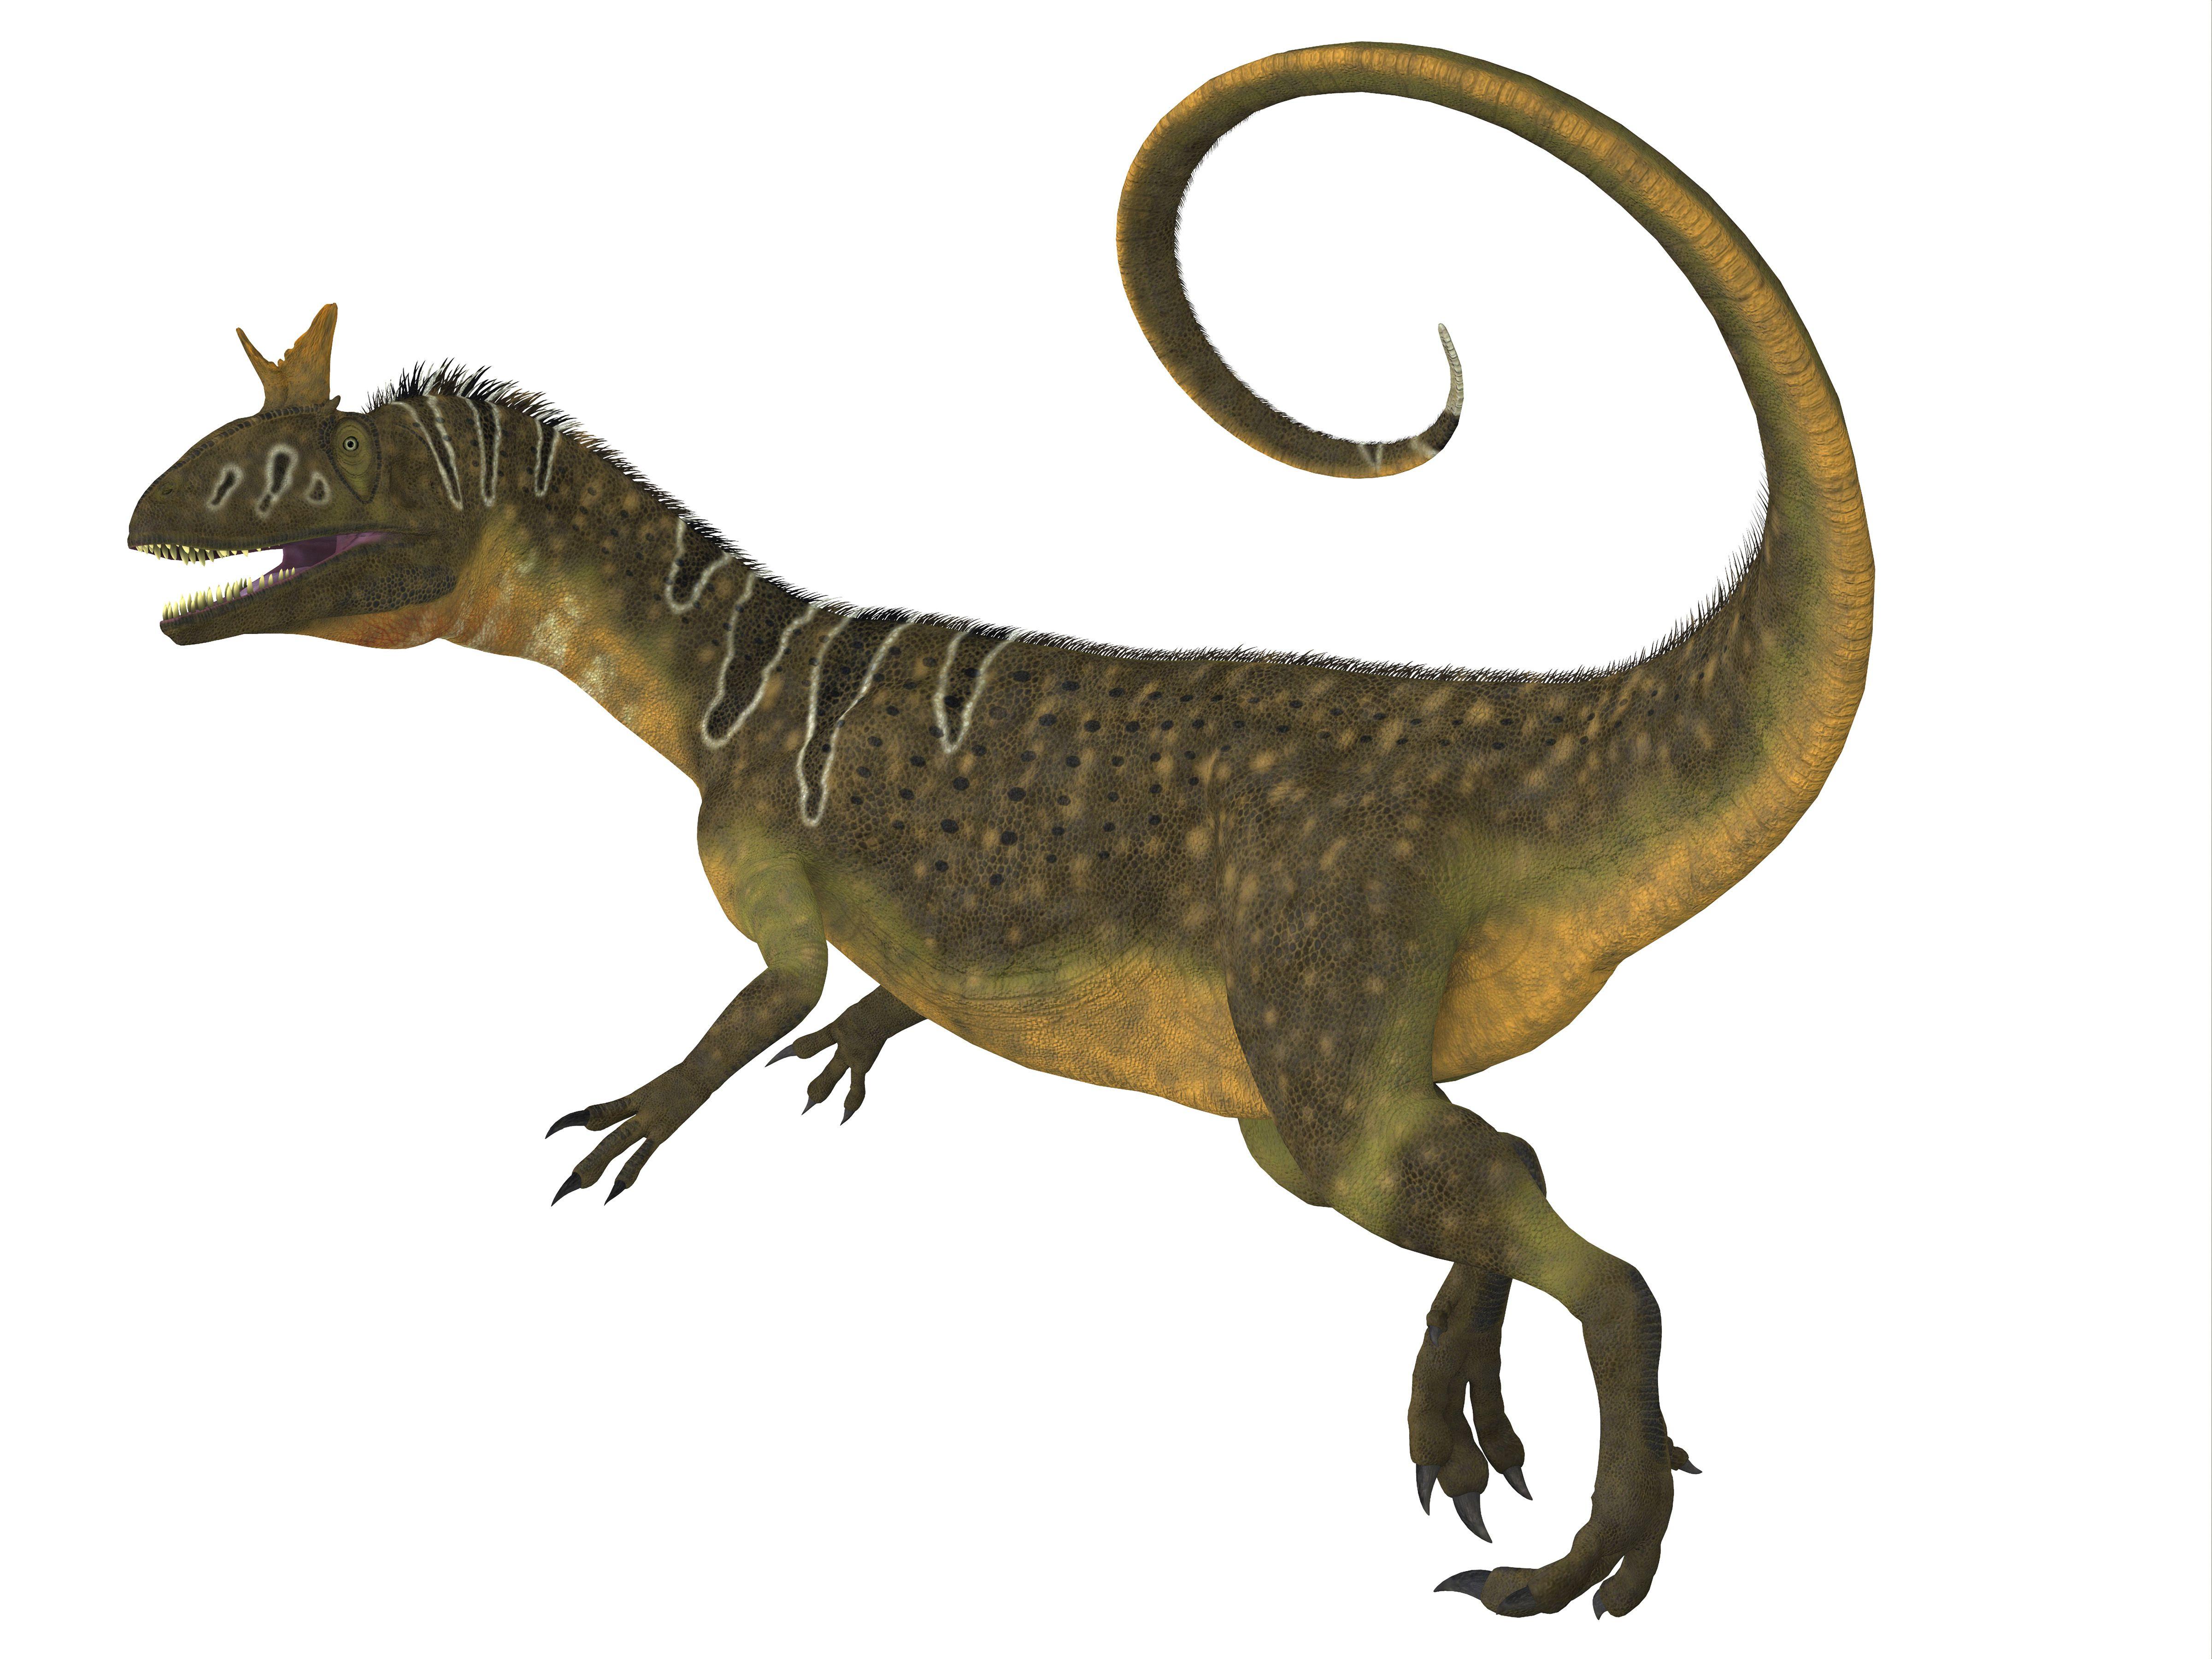 Cryolophosaurus dinosaur, side view.